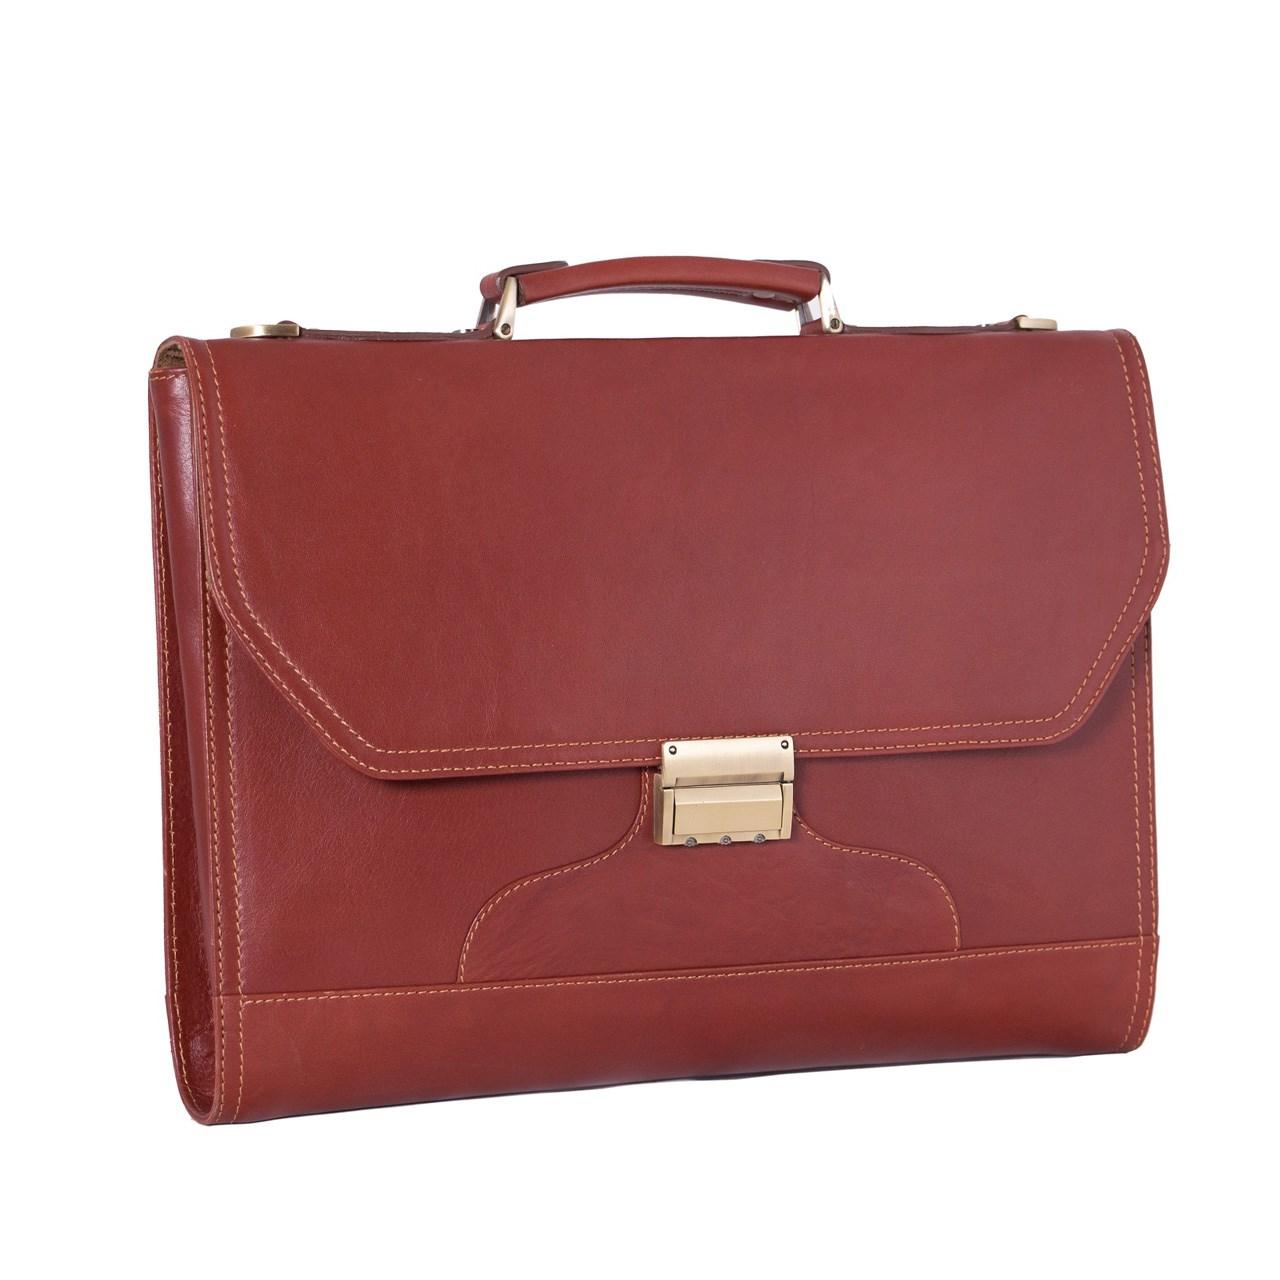 کیف اداری چرم طبیعی آدین چرم مدل DL16